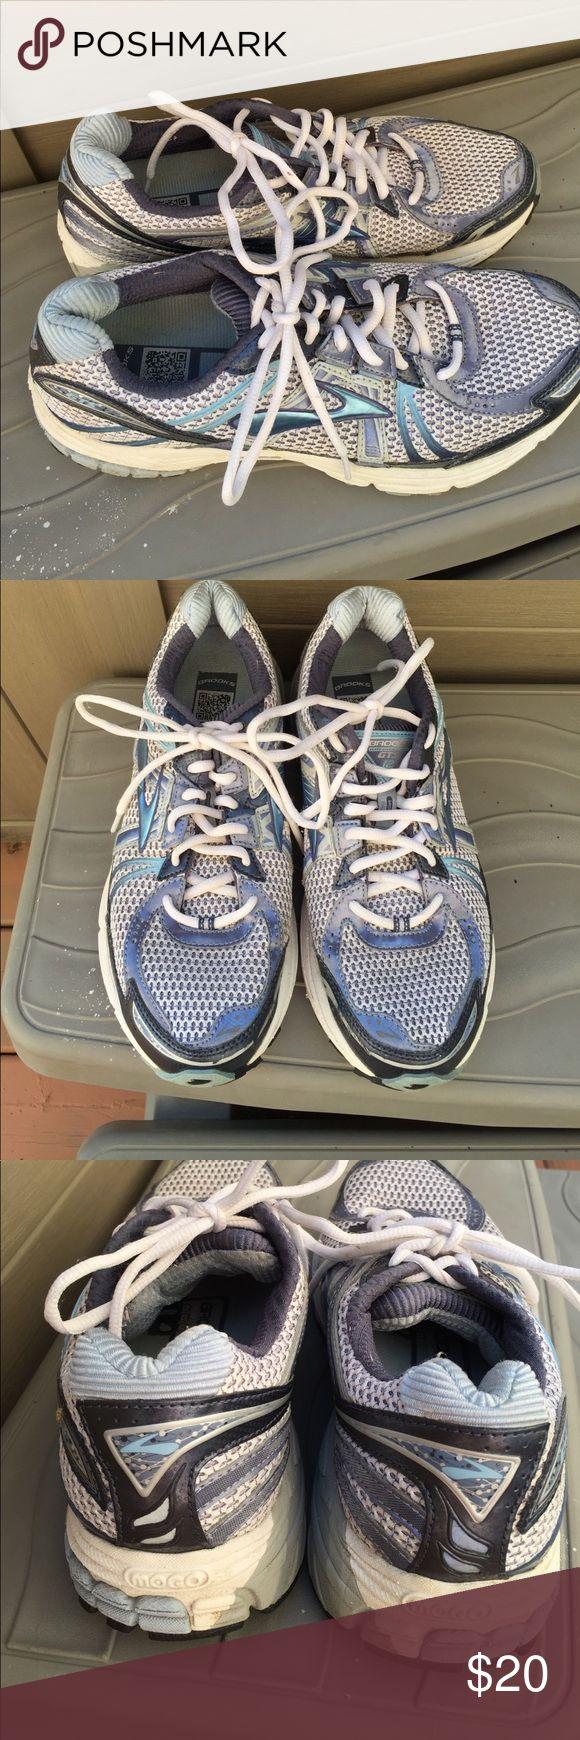 Brooks GTS12 Tennis Shoes Size 10 1/2 $20 Brooks GTS12 Tennis Shoes Size 10 1/2 $20 EUC Brooks Shoes Athletic Shoes